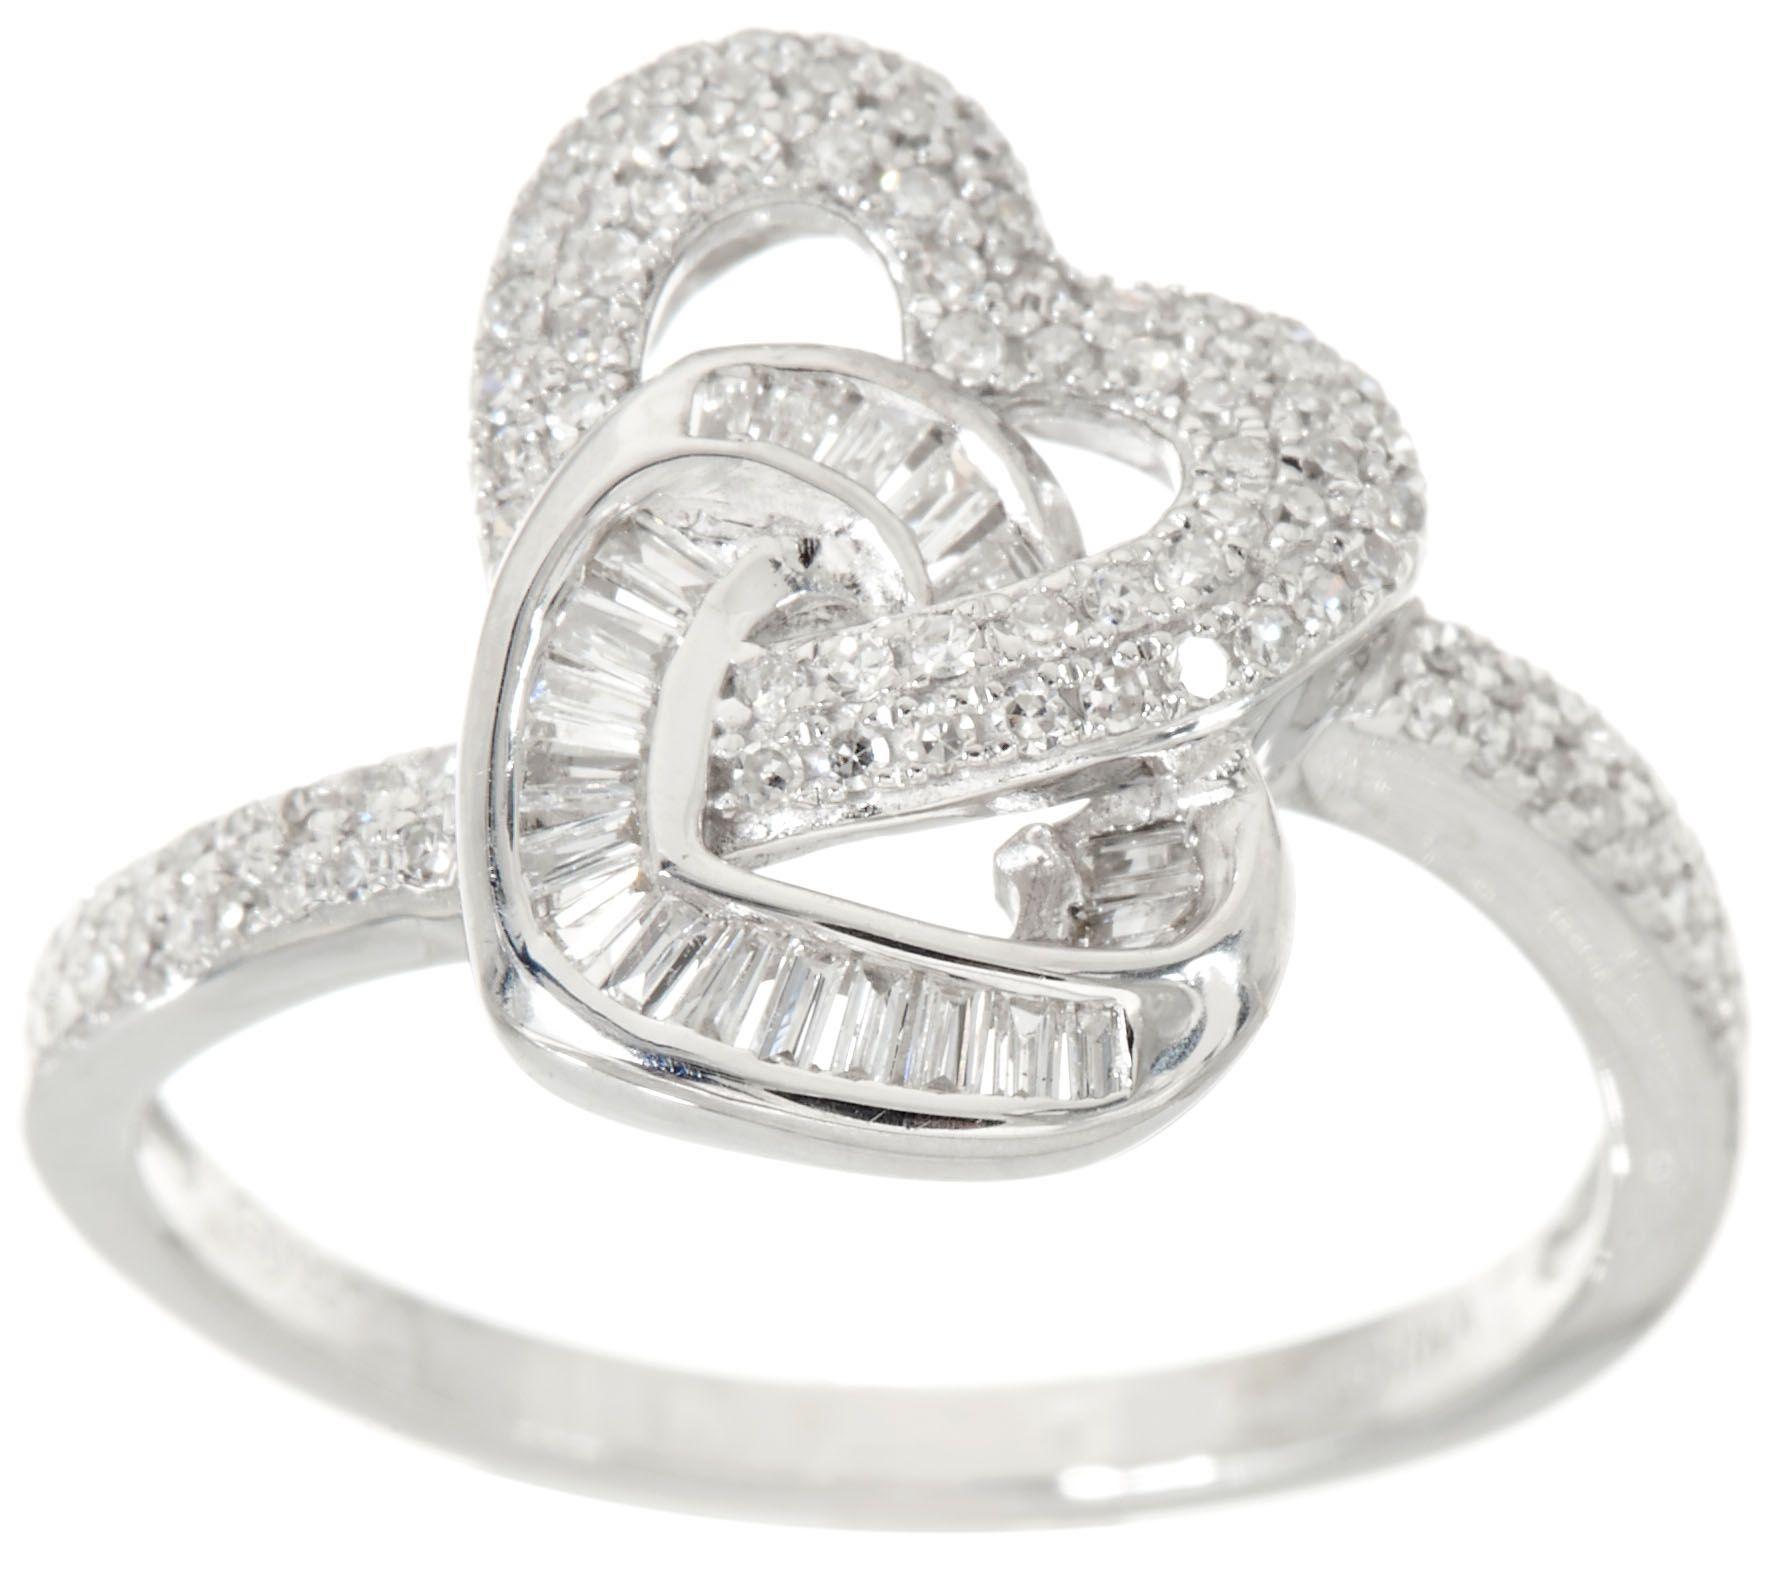 pave diamond interlocking heart ring sterling by affinity j347533 - Qvc Wedding Rings